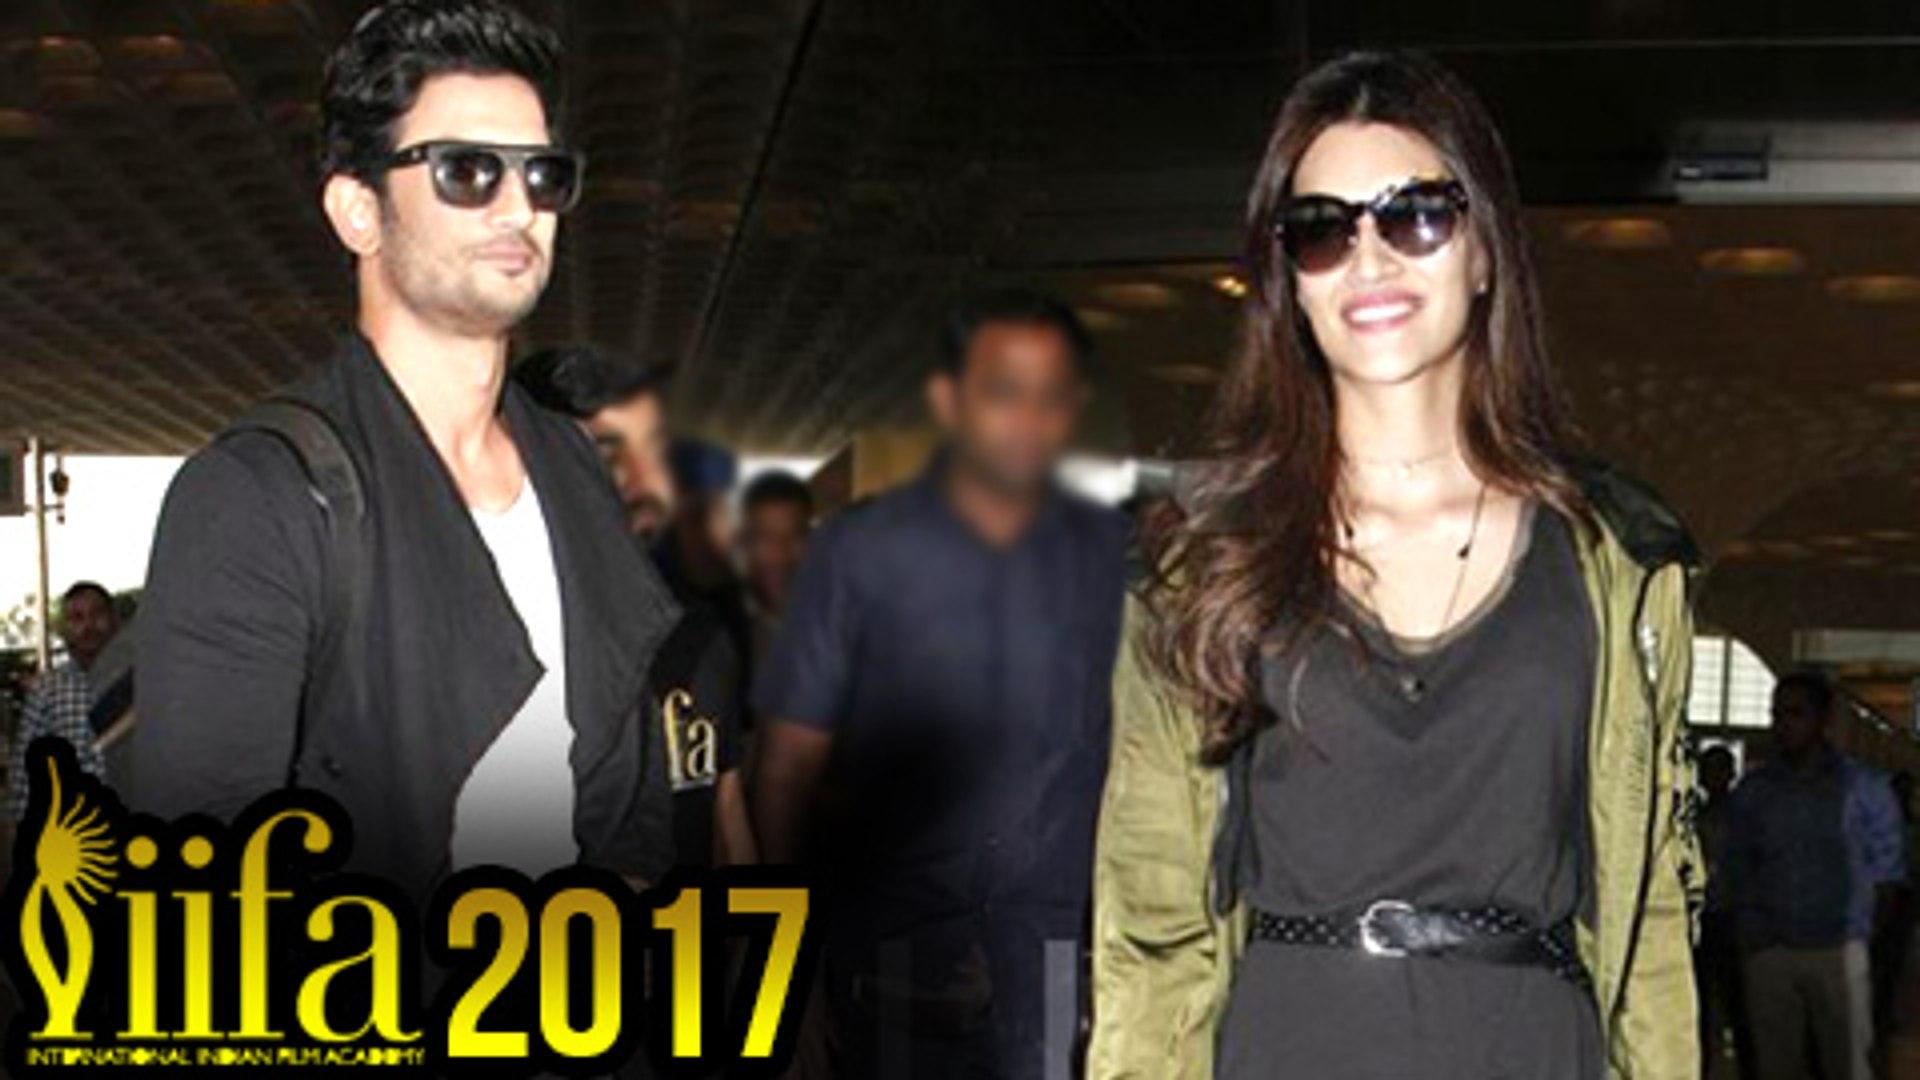 IIFA 2017 Sushant Singh Rajput And Kriti Sanon Off To New York